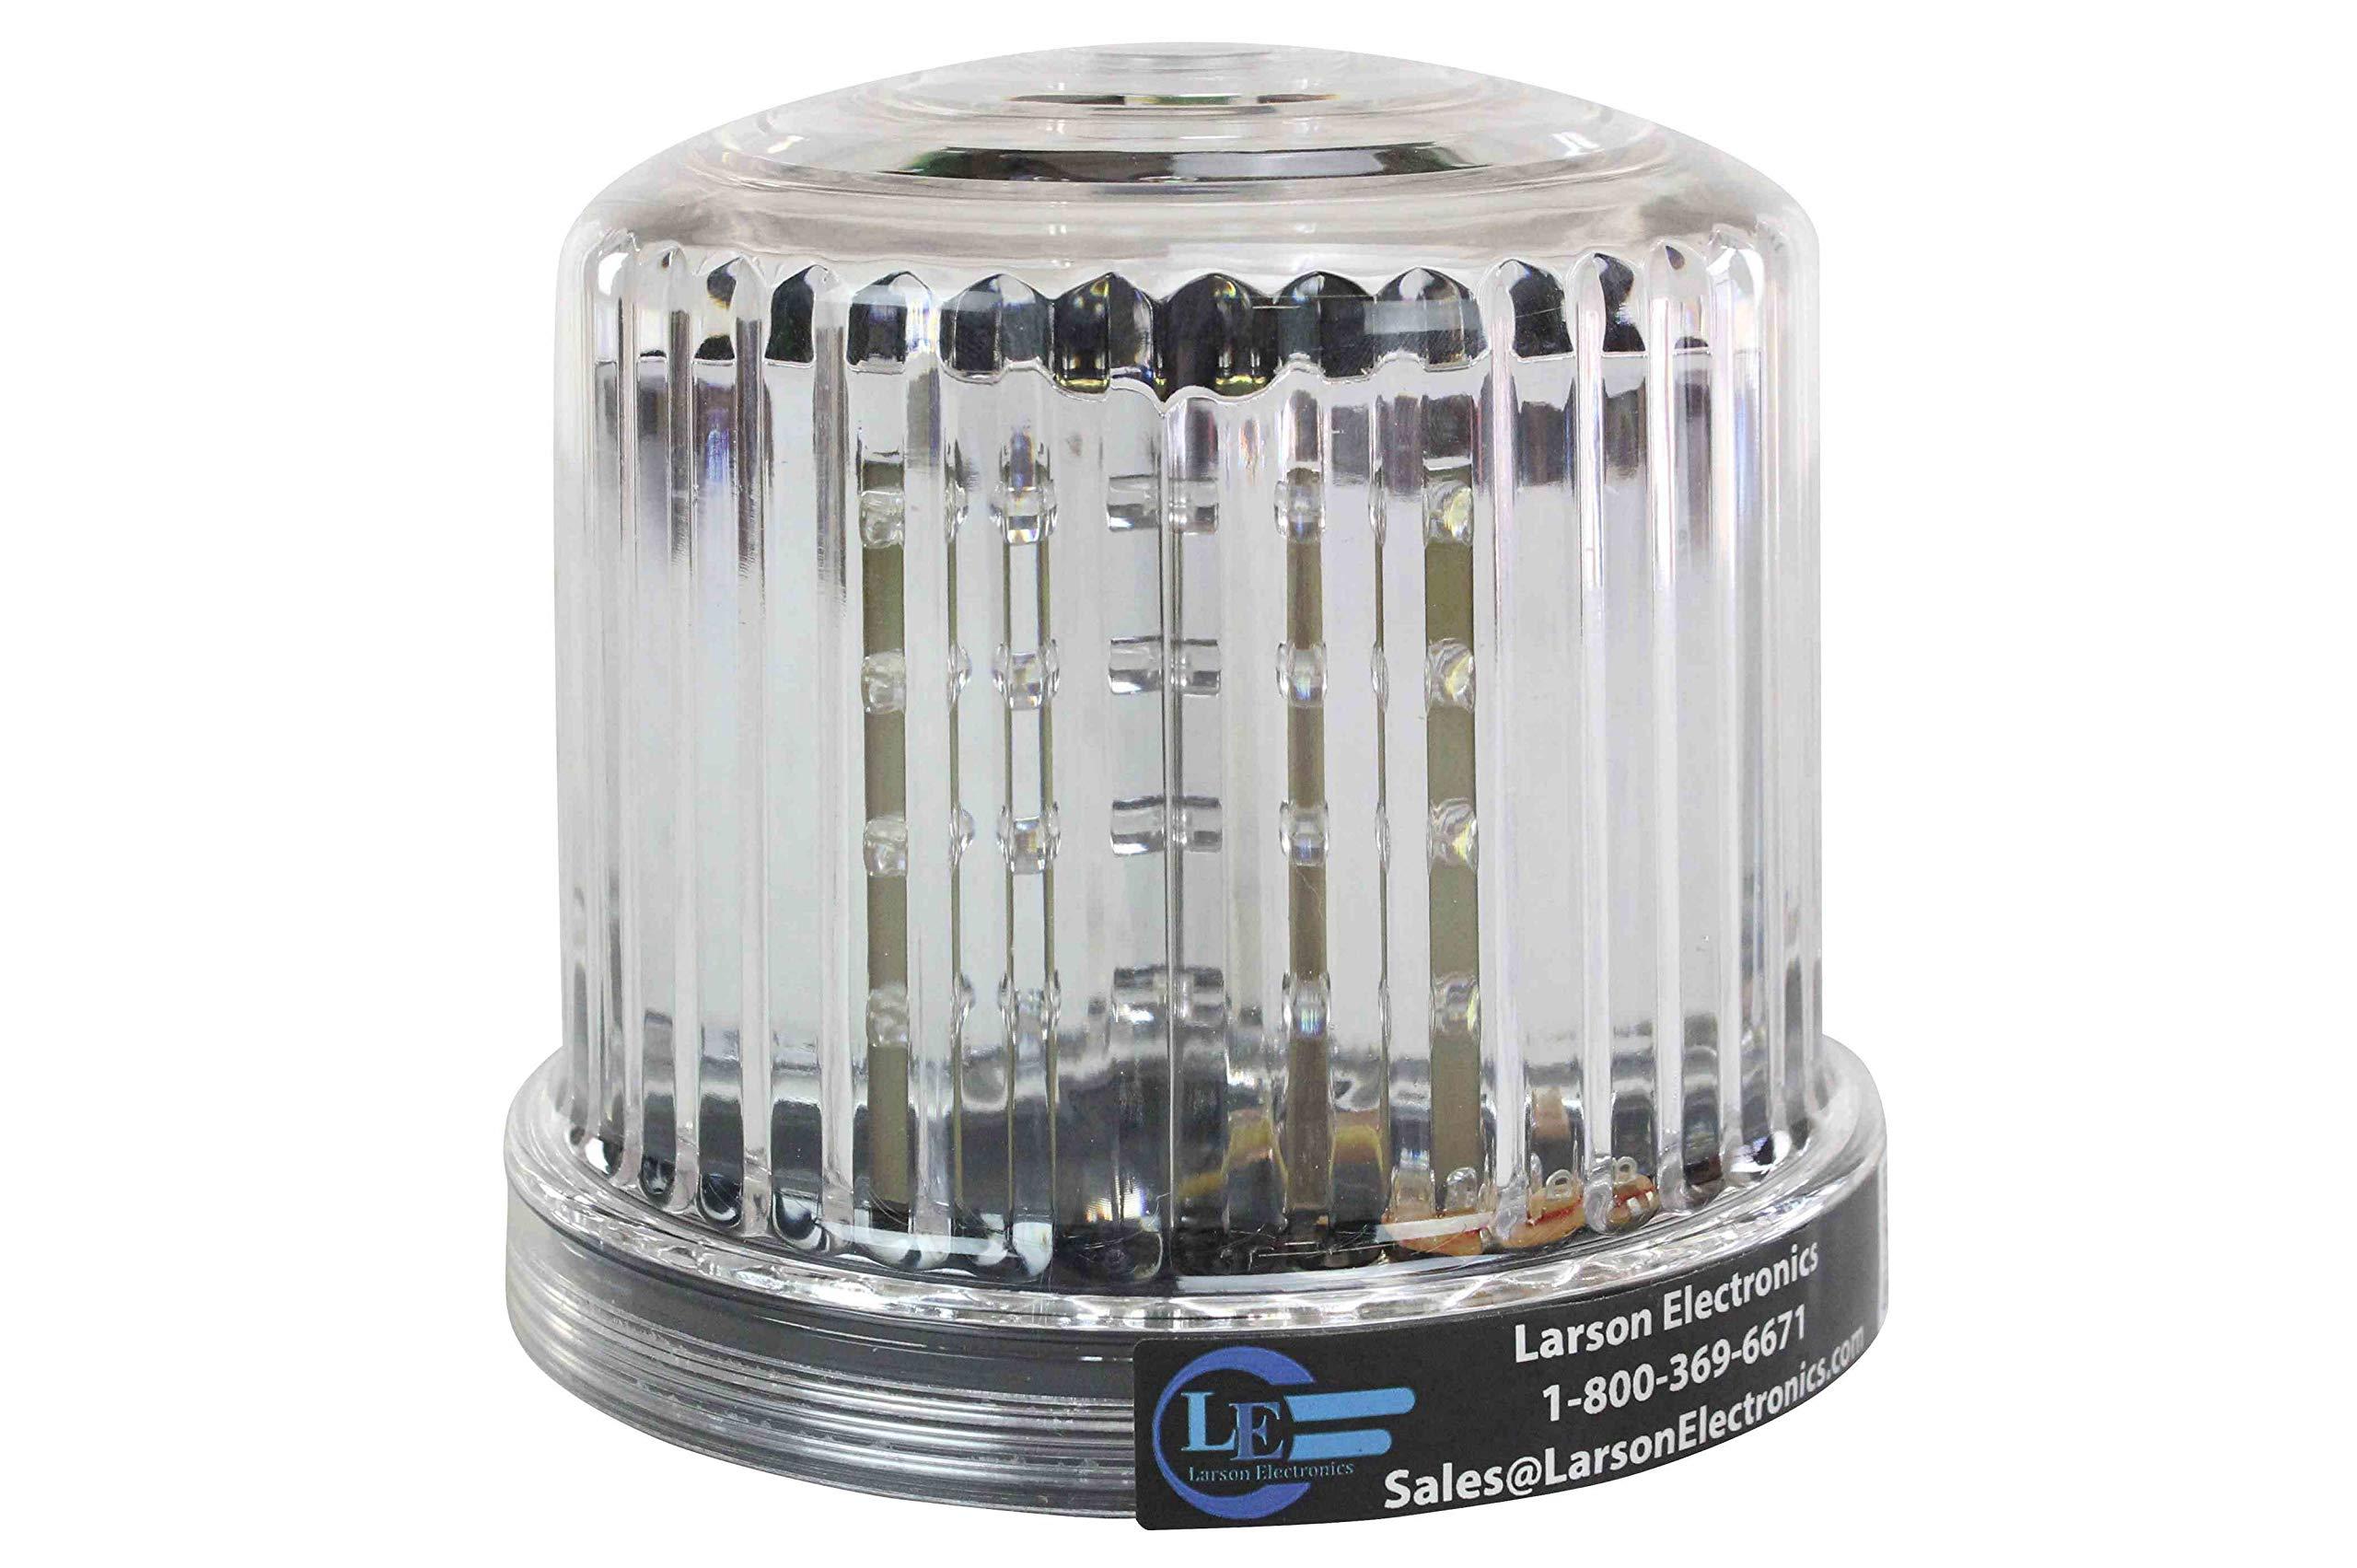 Larson Electronics White LED 360-Degree Battery Powered Beacon with Magnetic Base